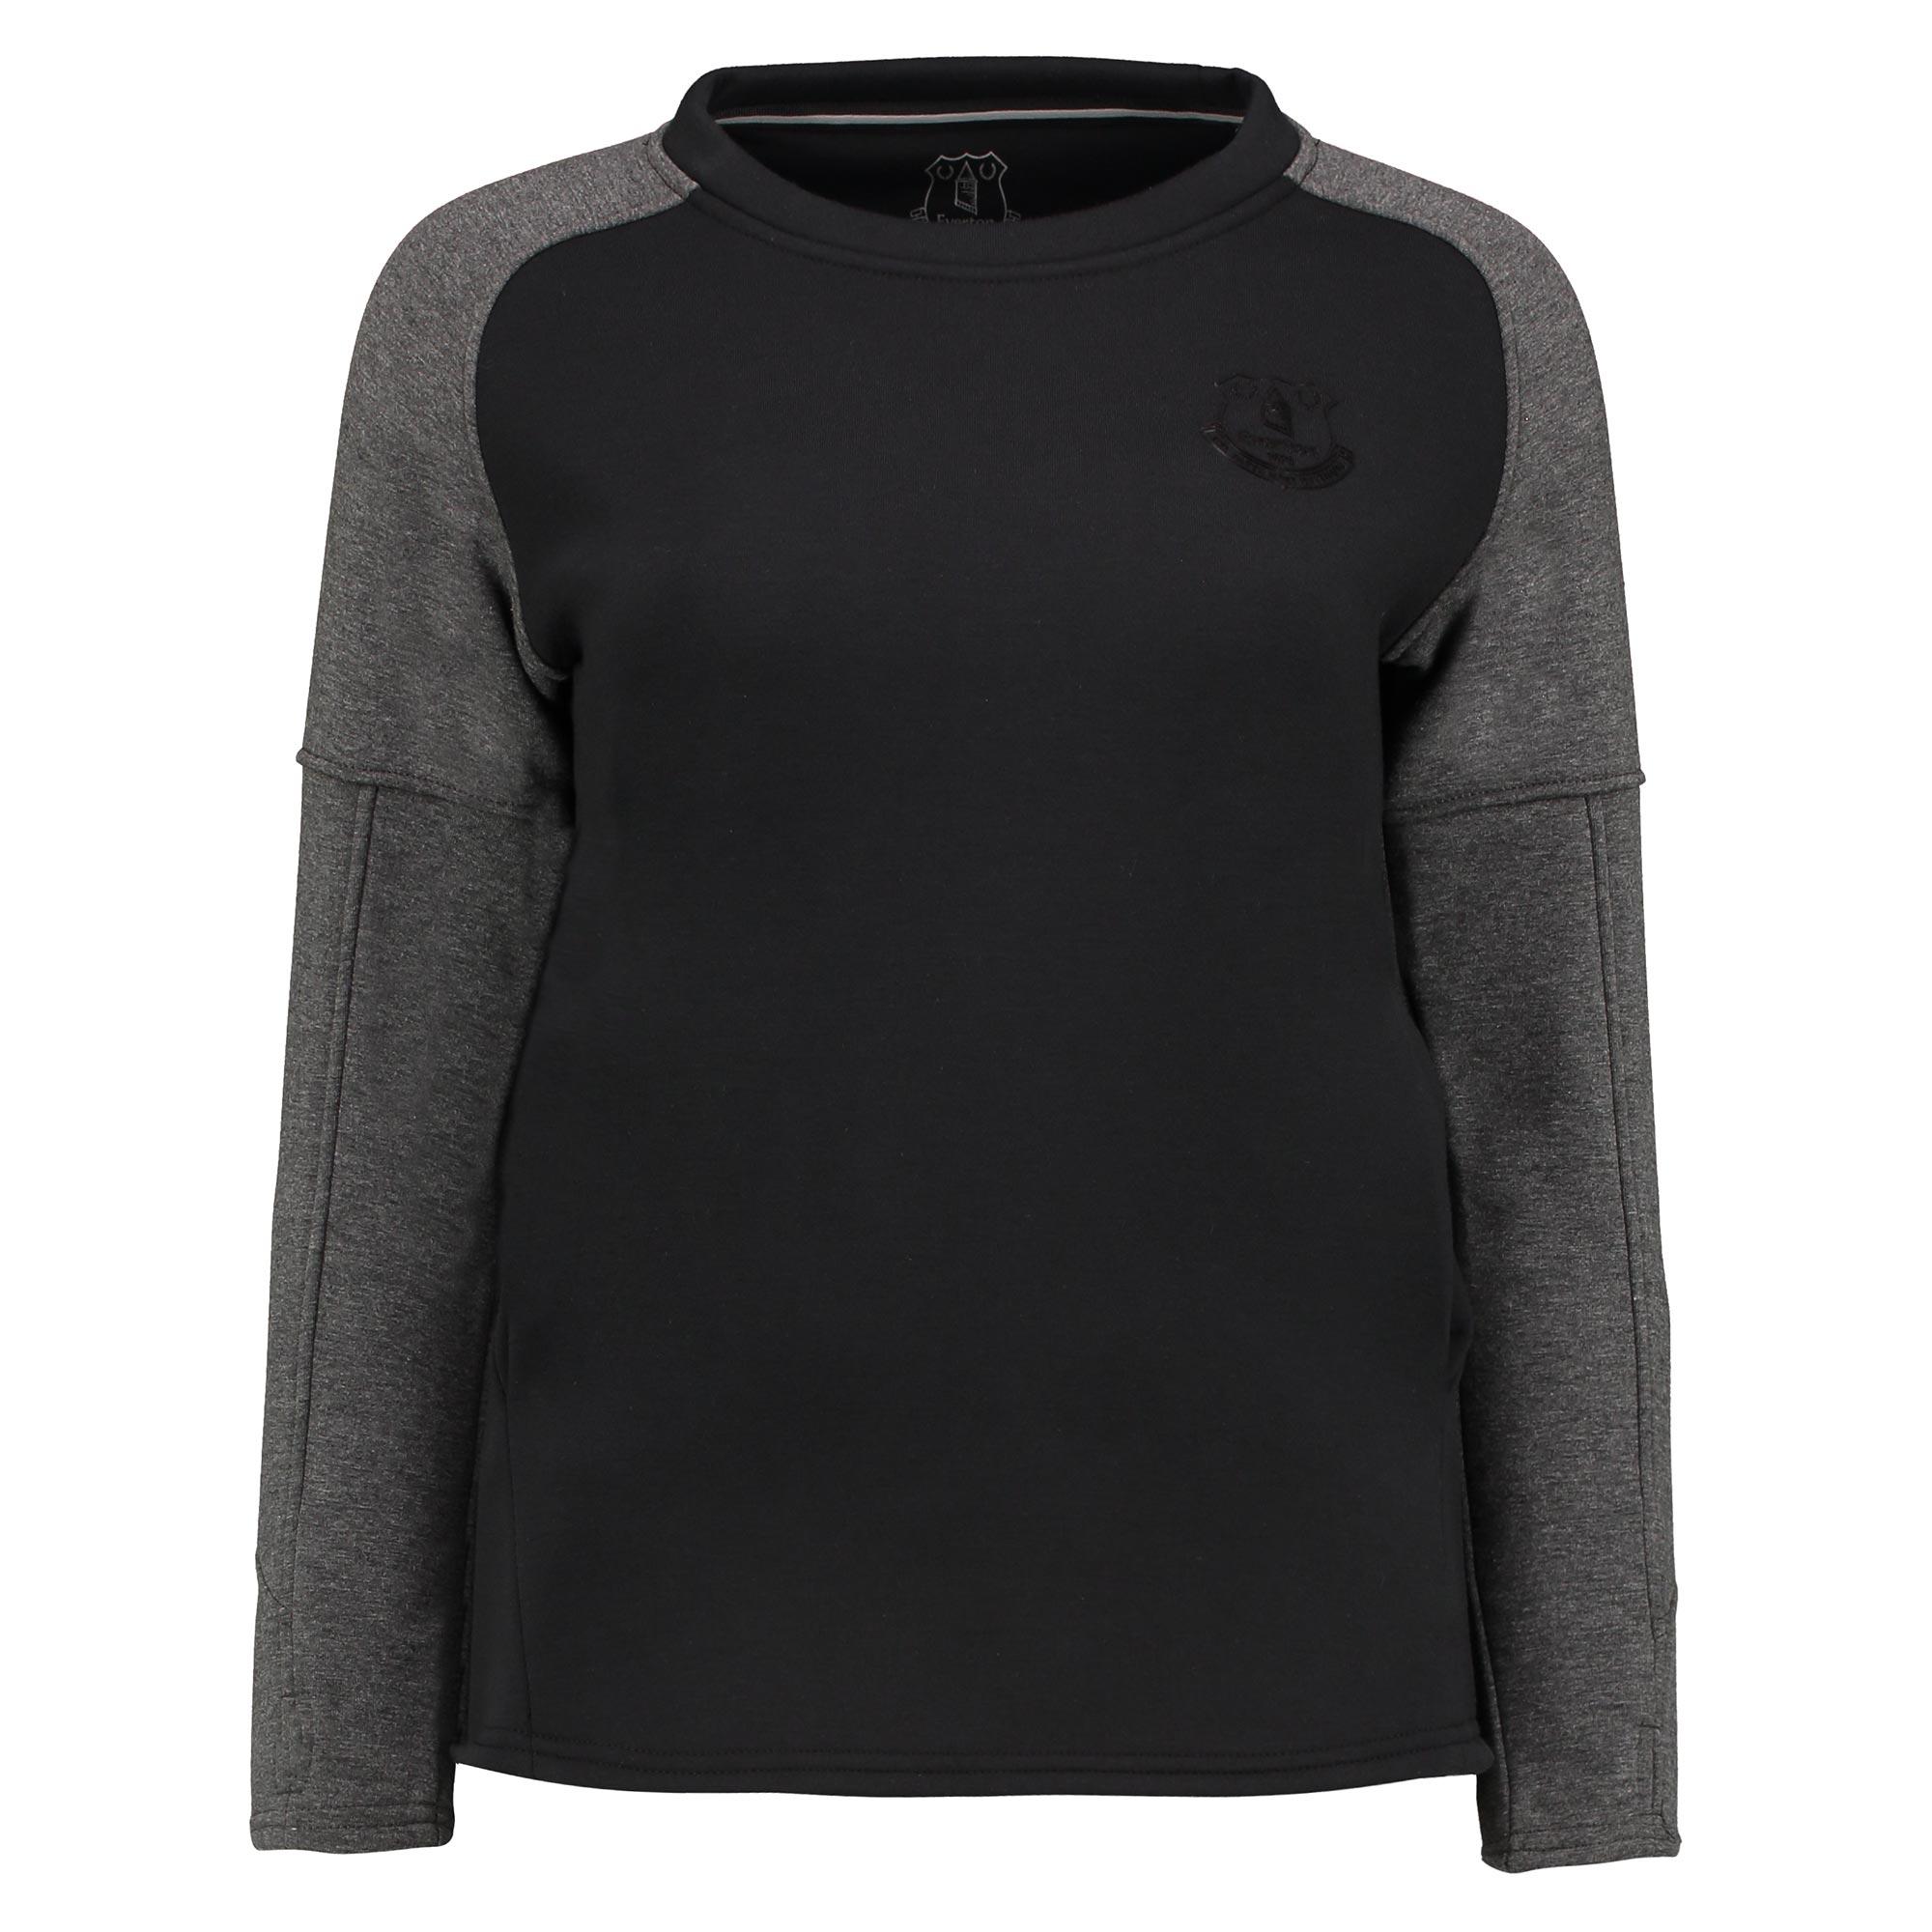 Image of Everton Ath Tech Fleece Sweater - Black/Charcoal Marl - Womens